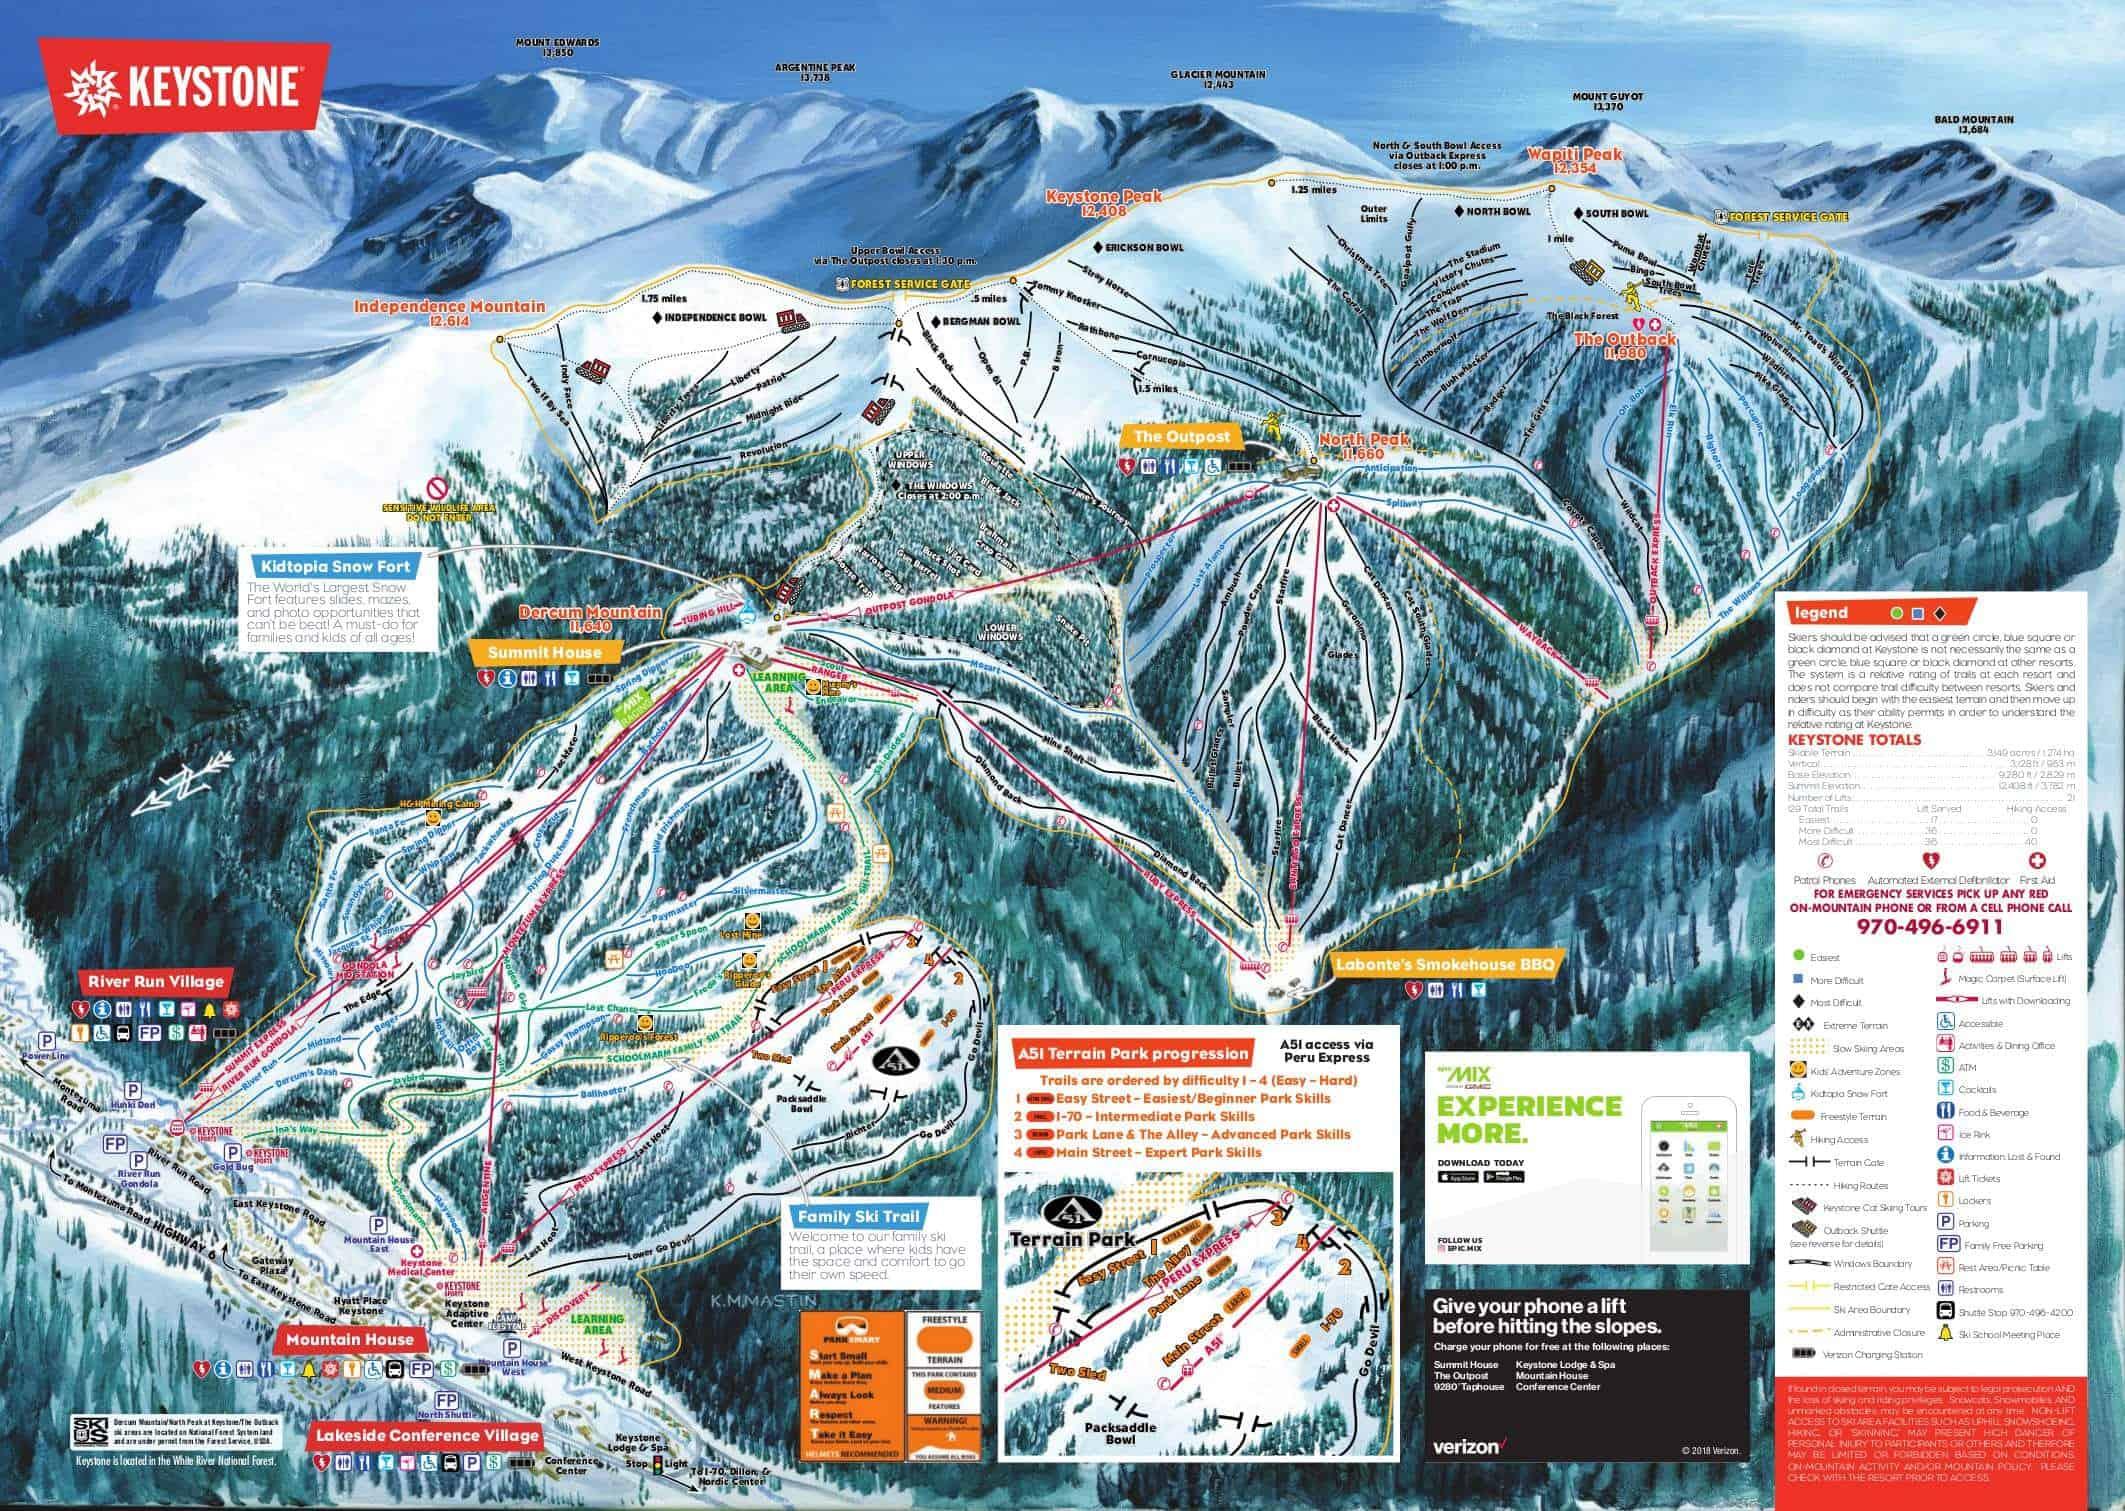 Keystone Ski Trail Map 2019